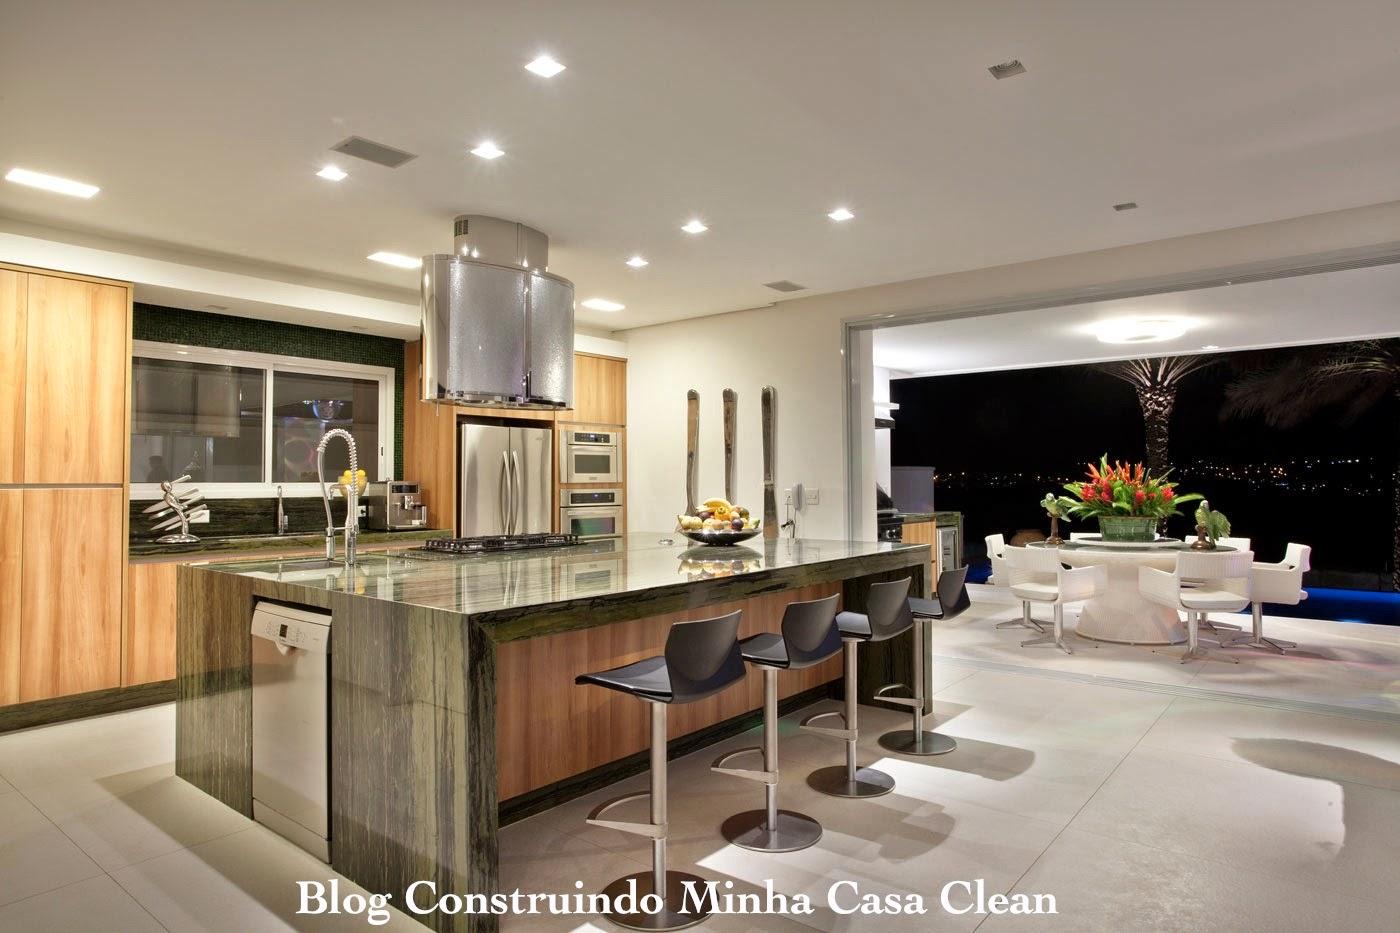 : Casa Branca Moderna e Maravilhosa! Fachada Interior e Projeto #183376 1400 933